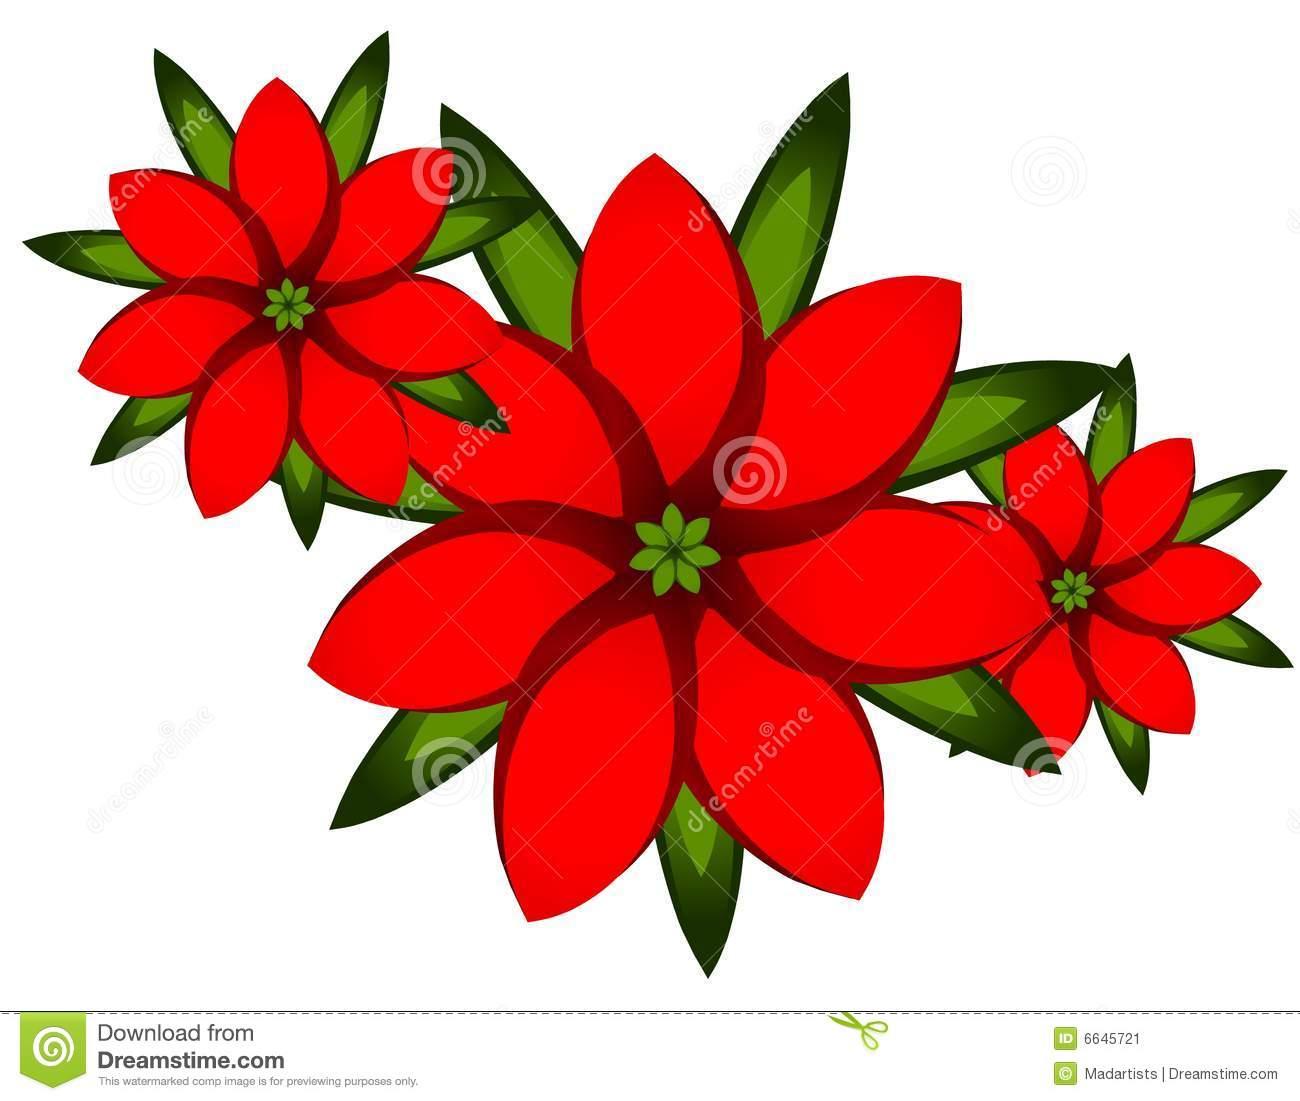 Xmas cliparts image download Poinsettia clip art free - ClipartFest image download